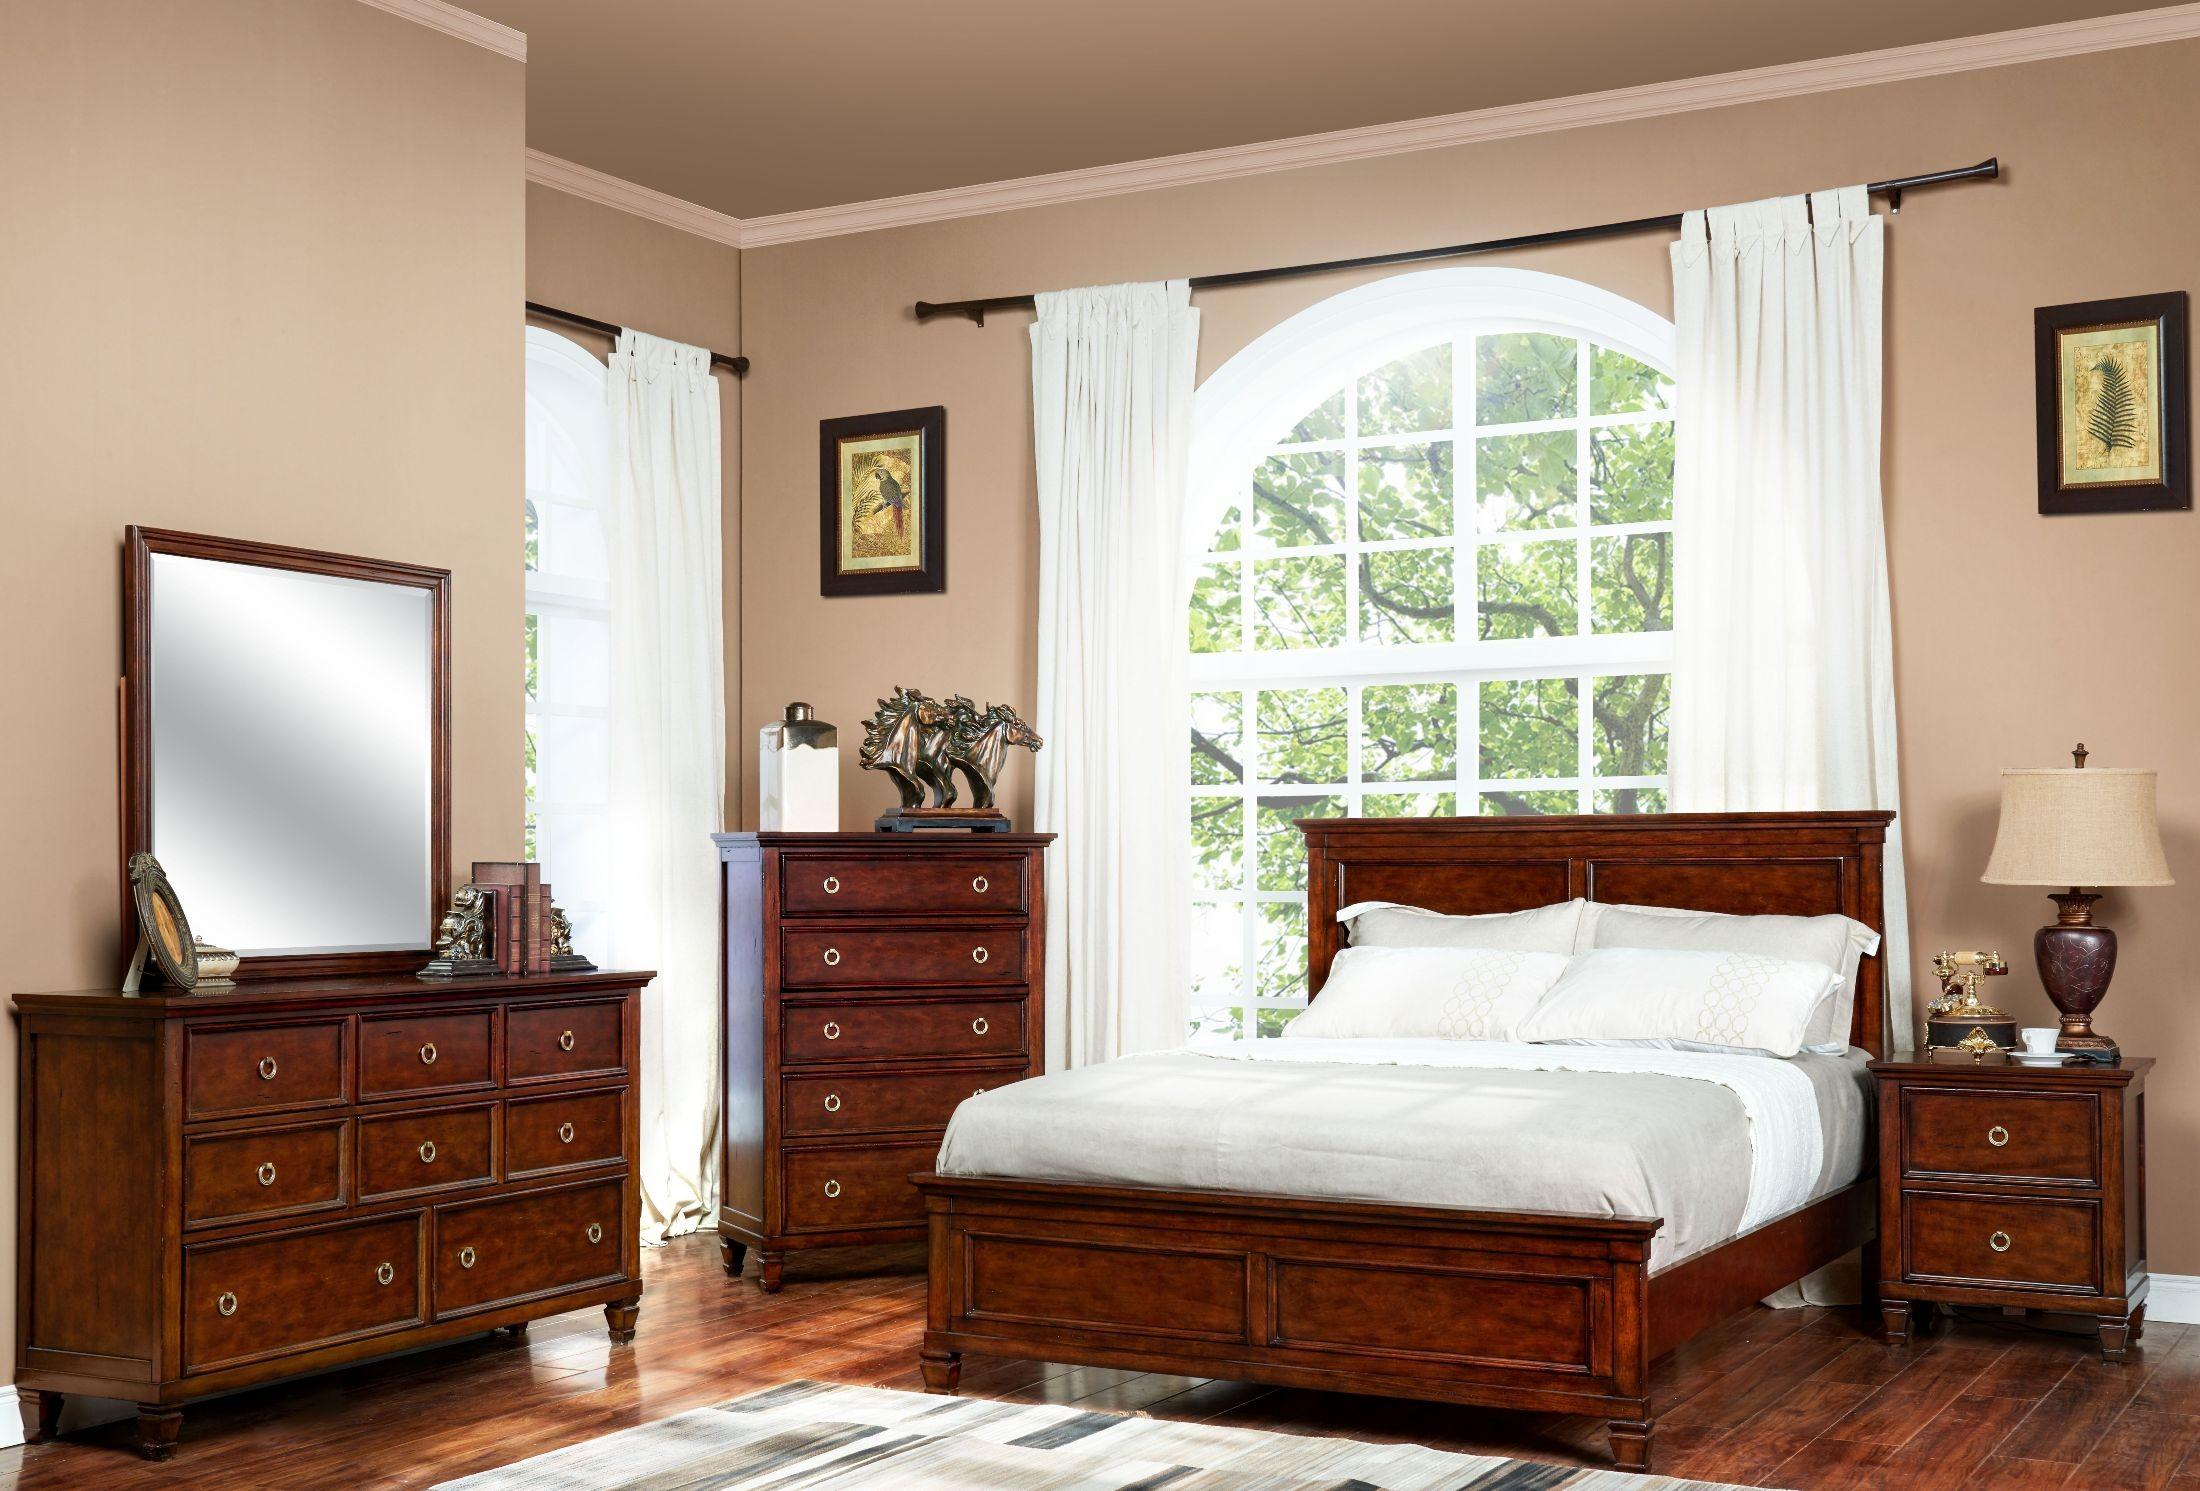 Tamarack Brown Cherry Panel Bedroom Set From New Classic | Coleman Furniture